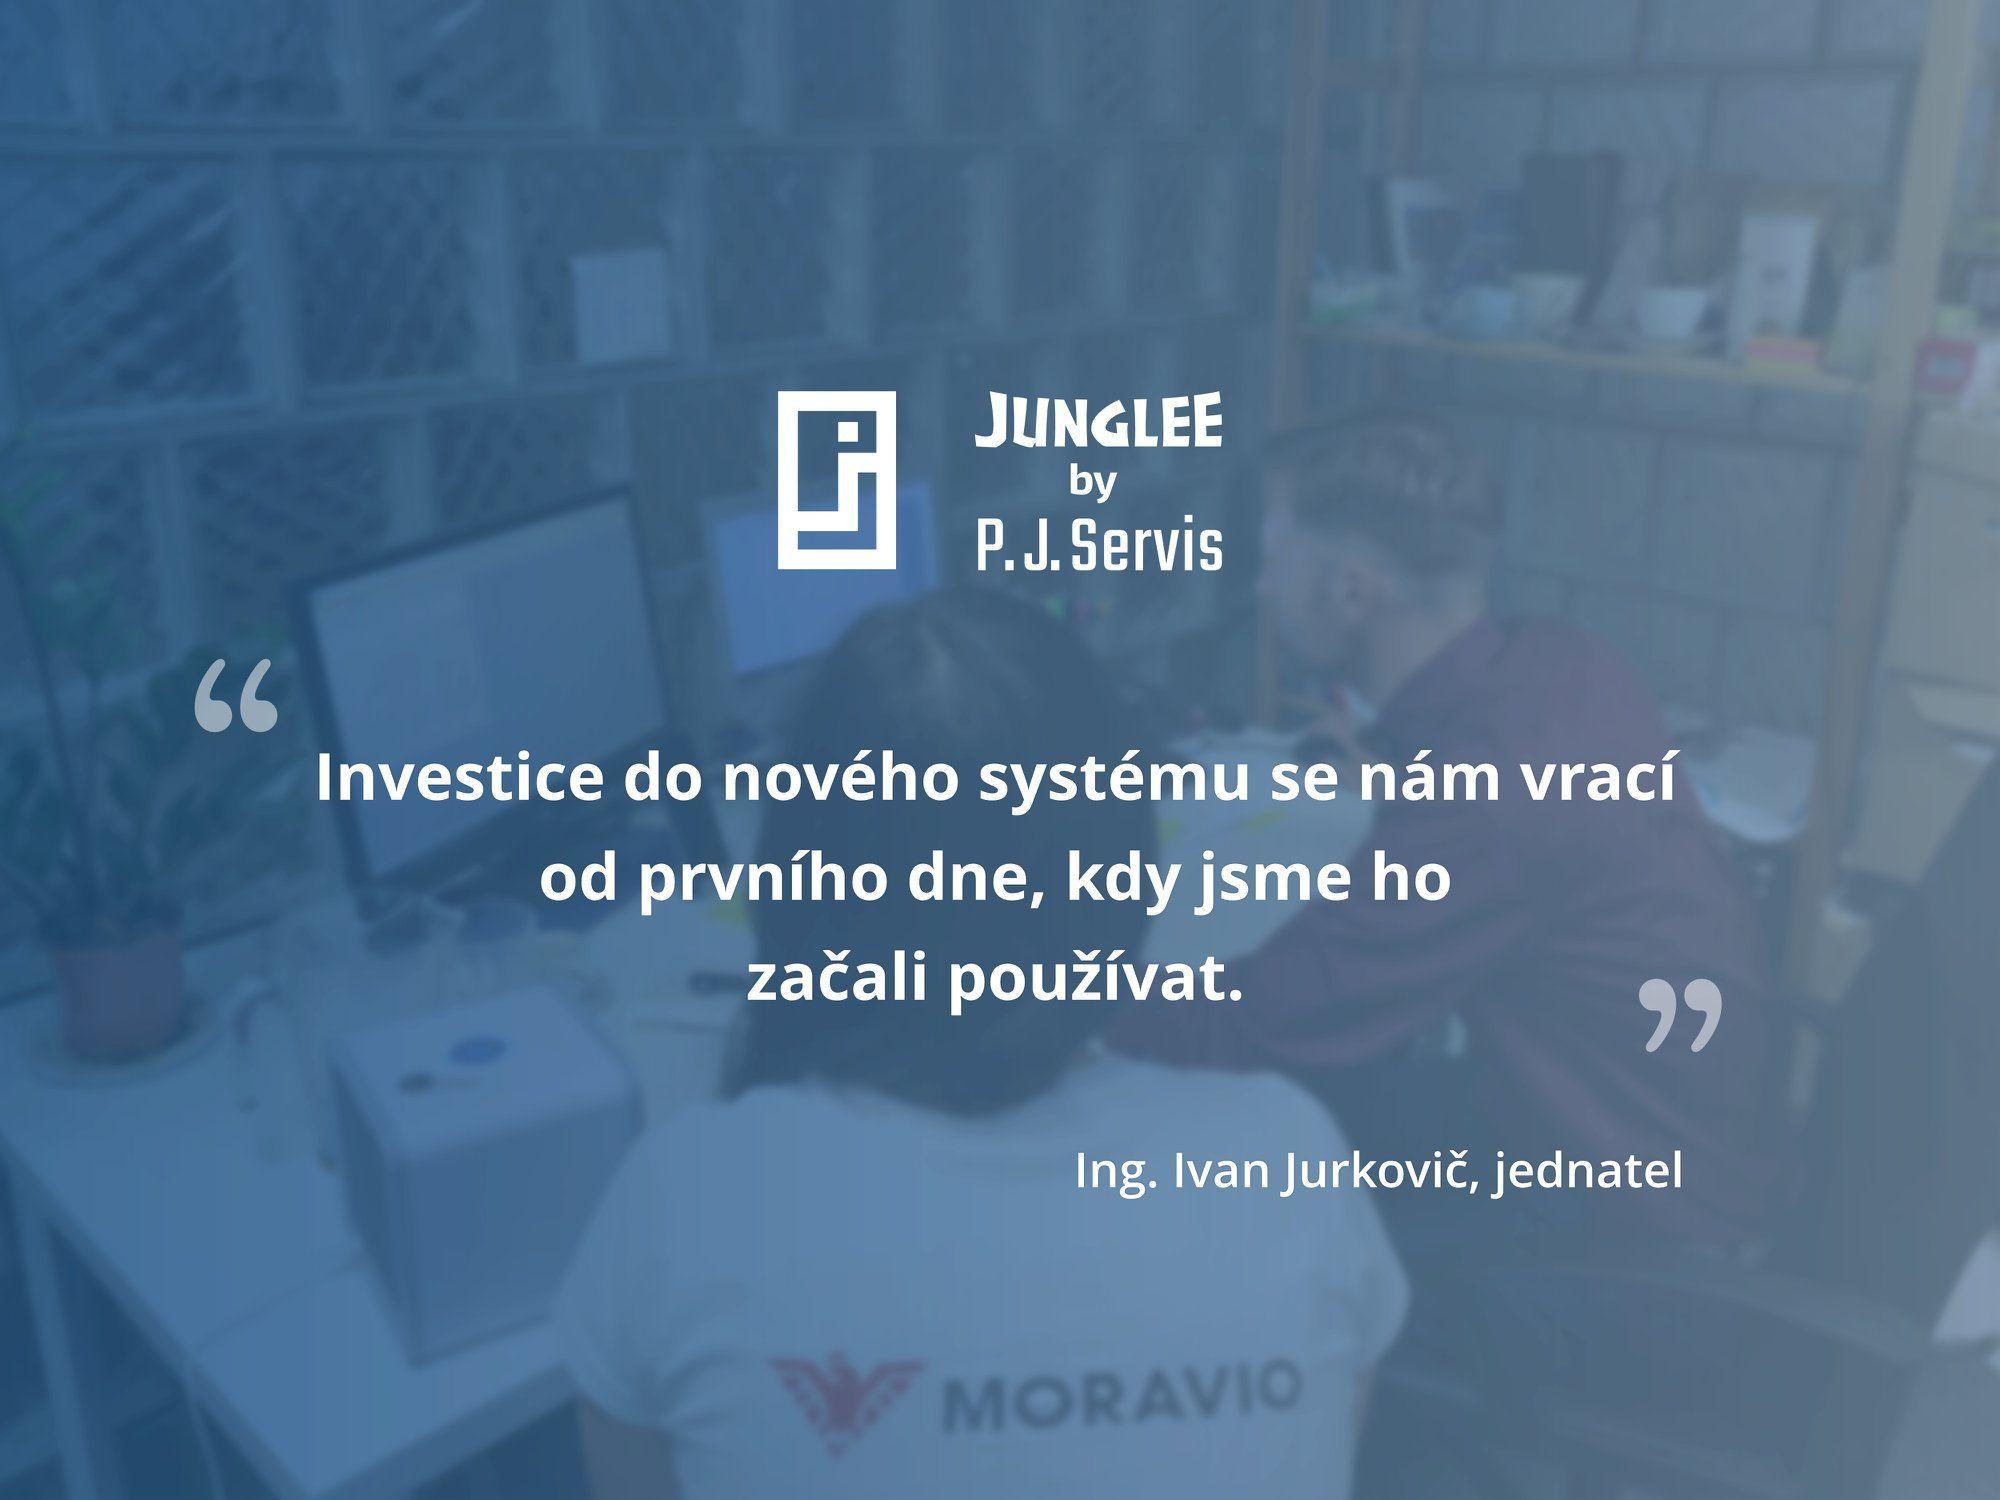 junglee_feedback.jpg